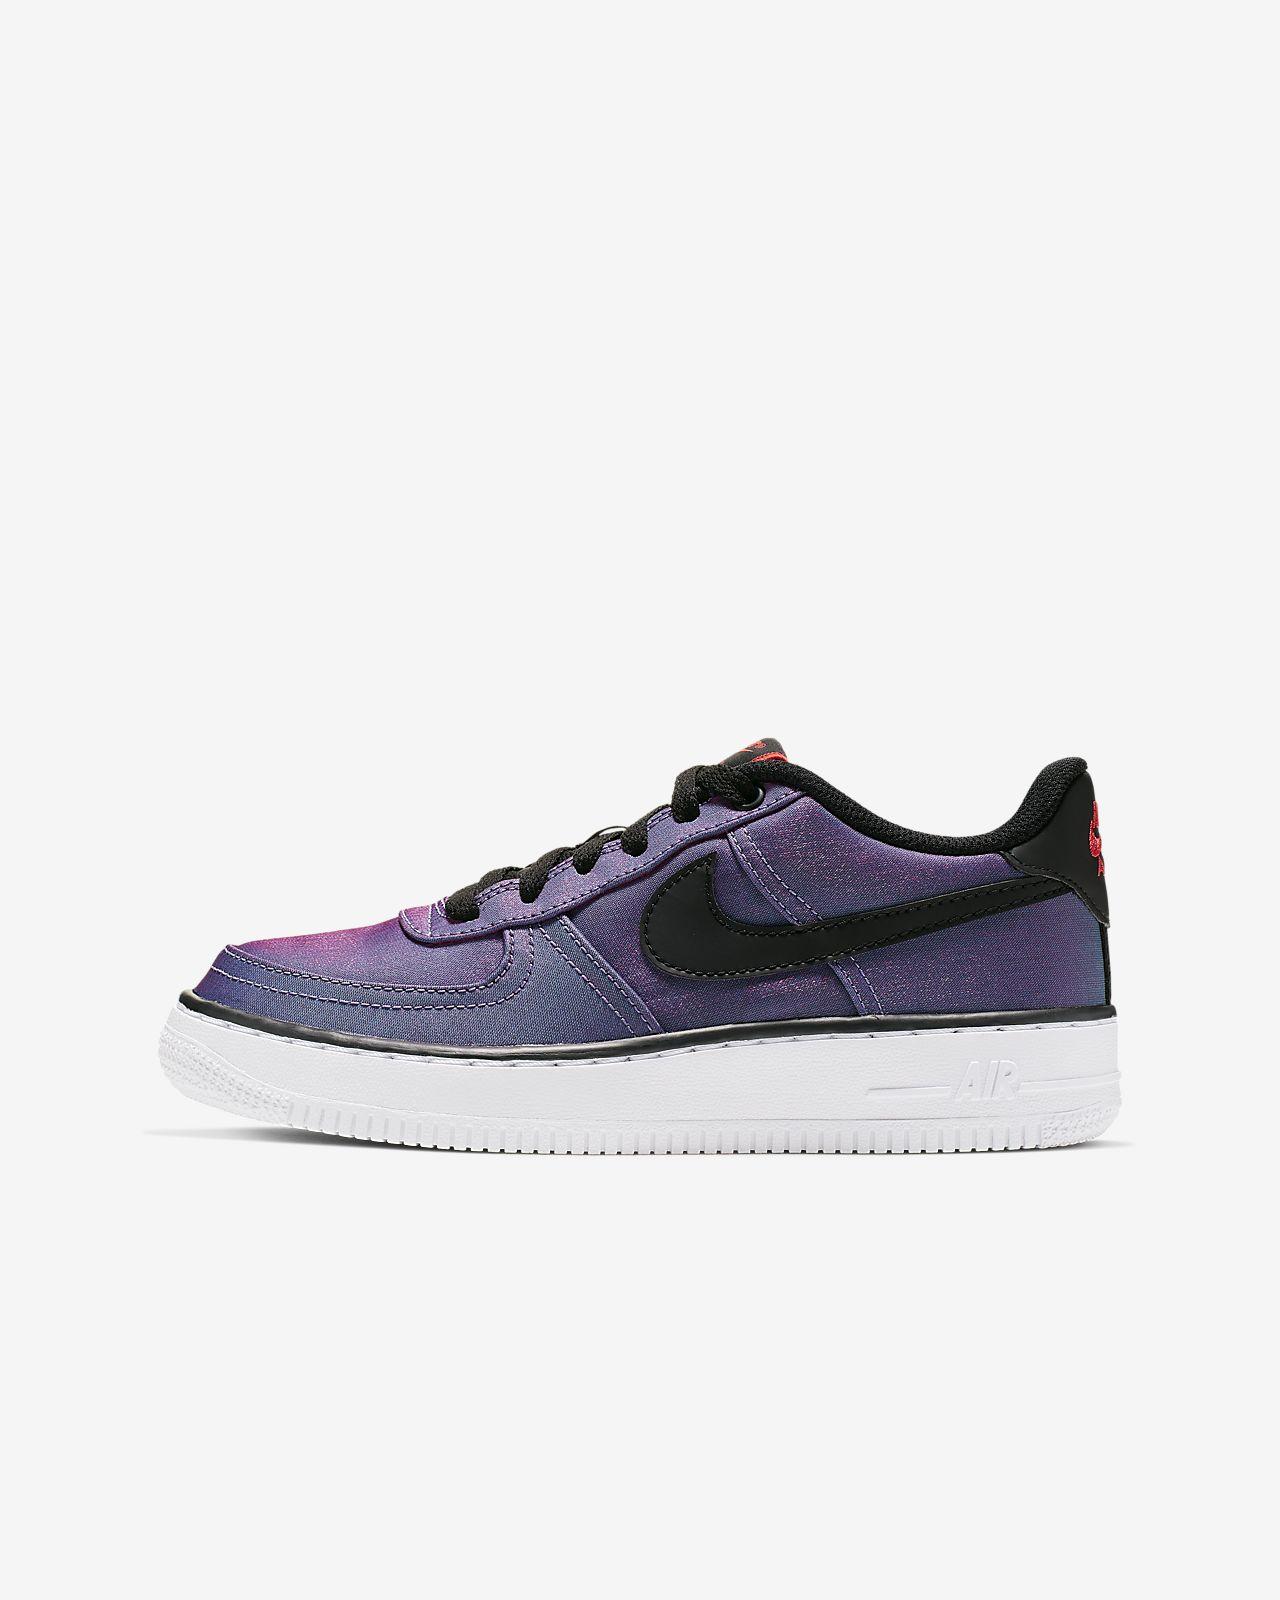 Nike Air Force 1 LV8 Shift Sabatilles - Nen/a